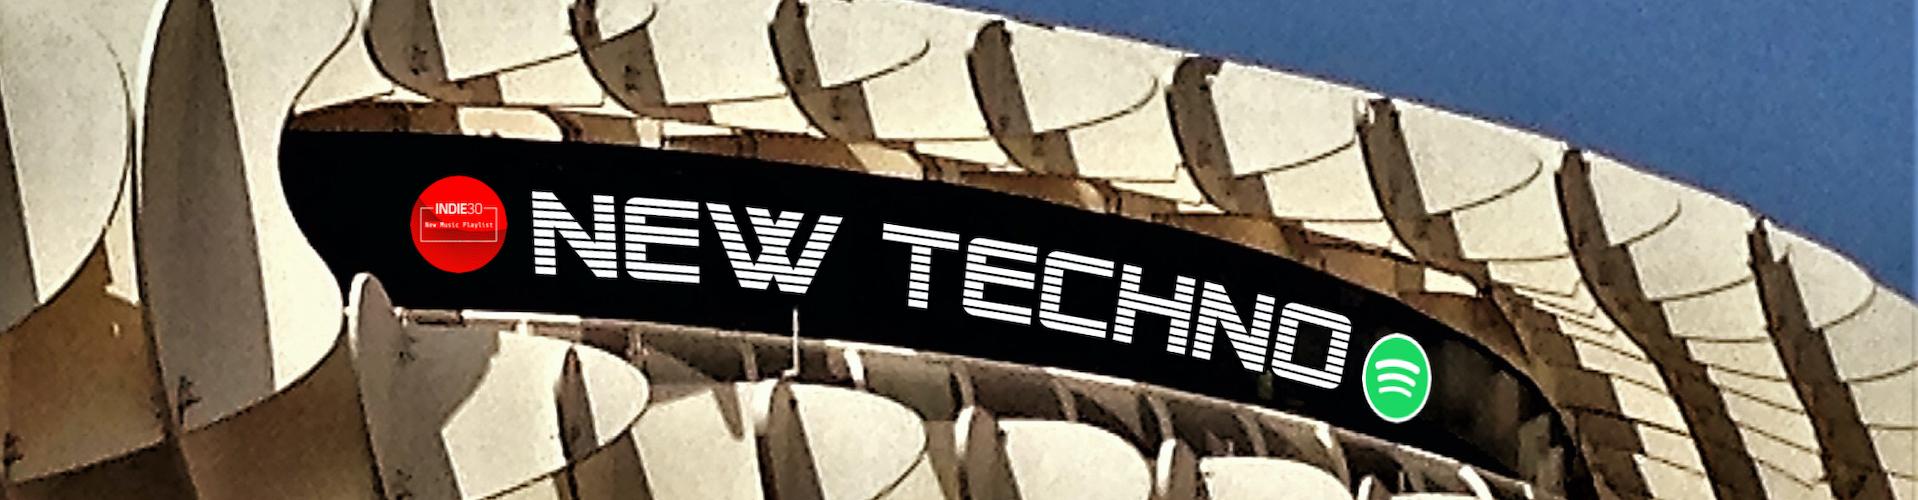 New-Techno-Playlist-Banner-Metropol-Parasol-Sevilla